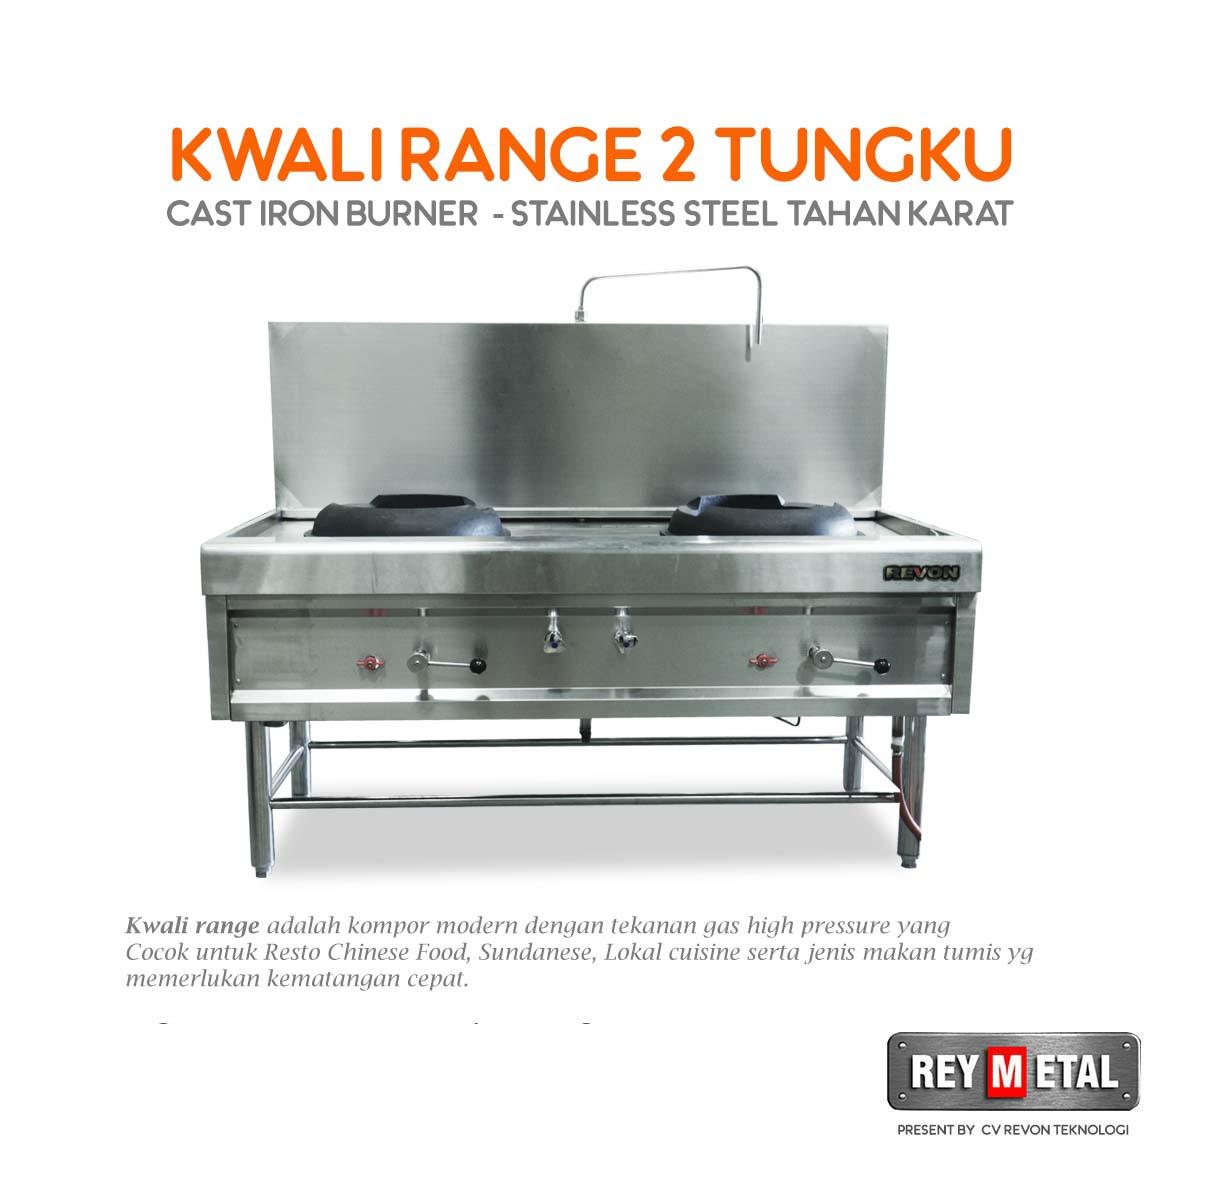 Jual Kwali Range 2 Tungku